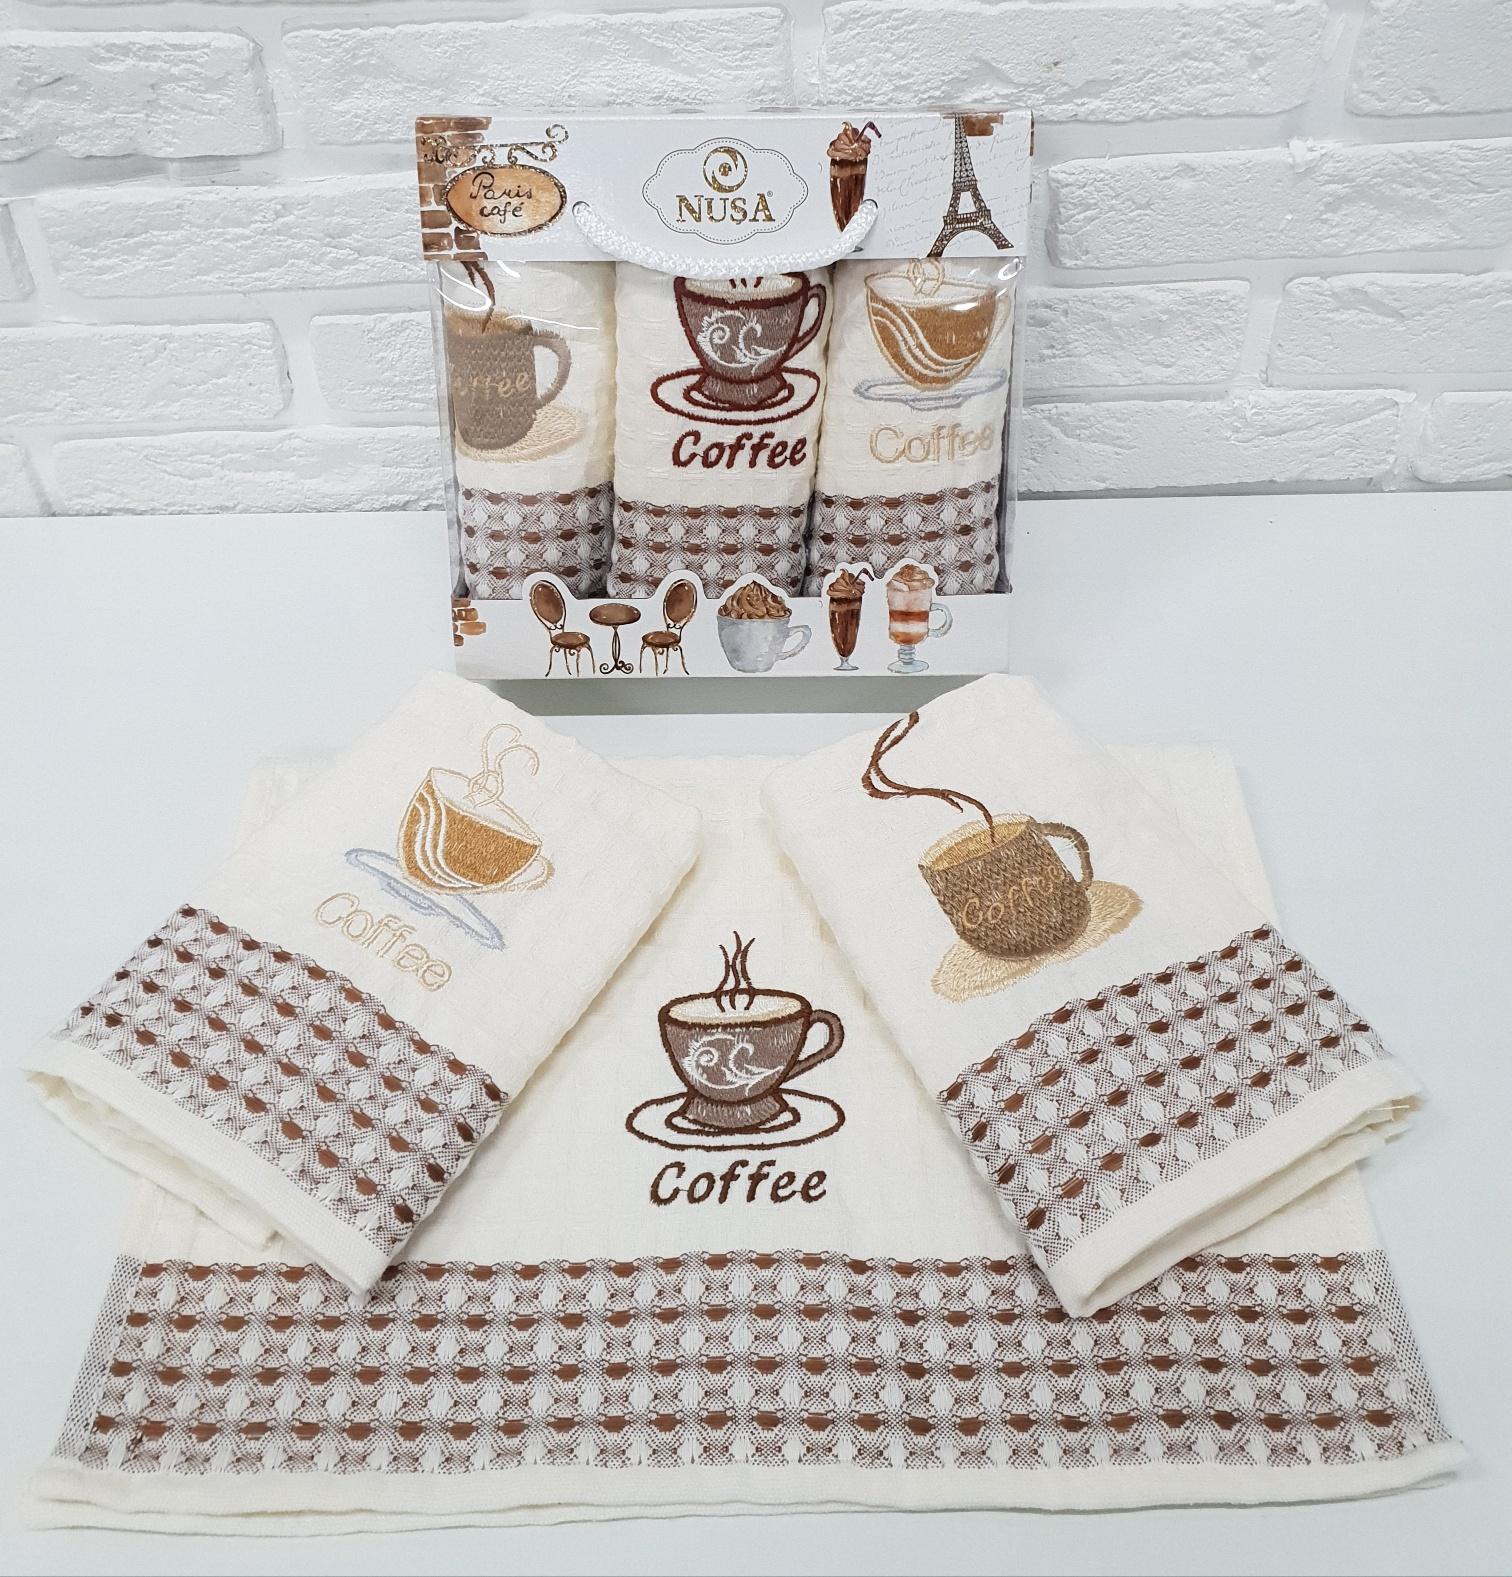 Купить Полотенца Nusa, Кухонное полотенце Кофе (35х50 см - 3 шт), Турция, Вафля